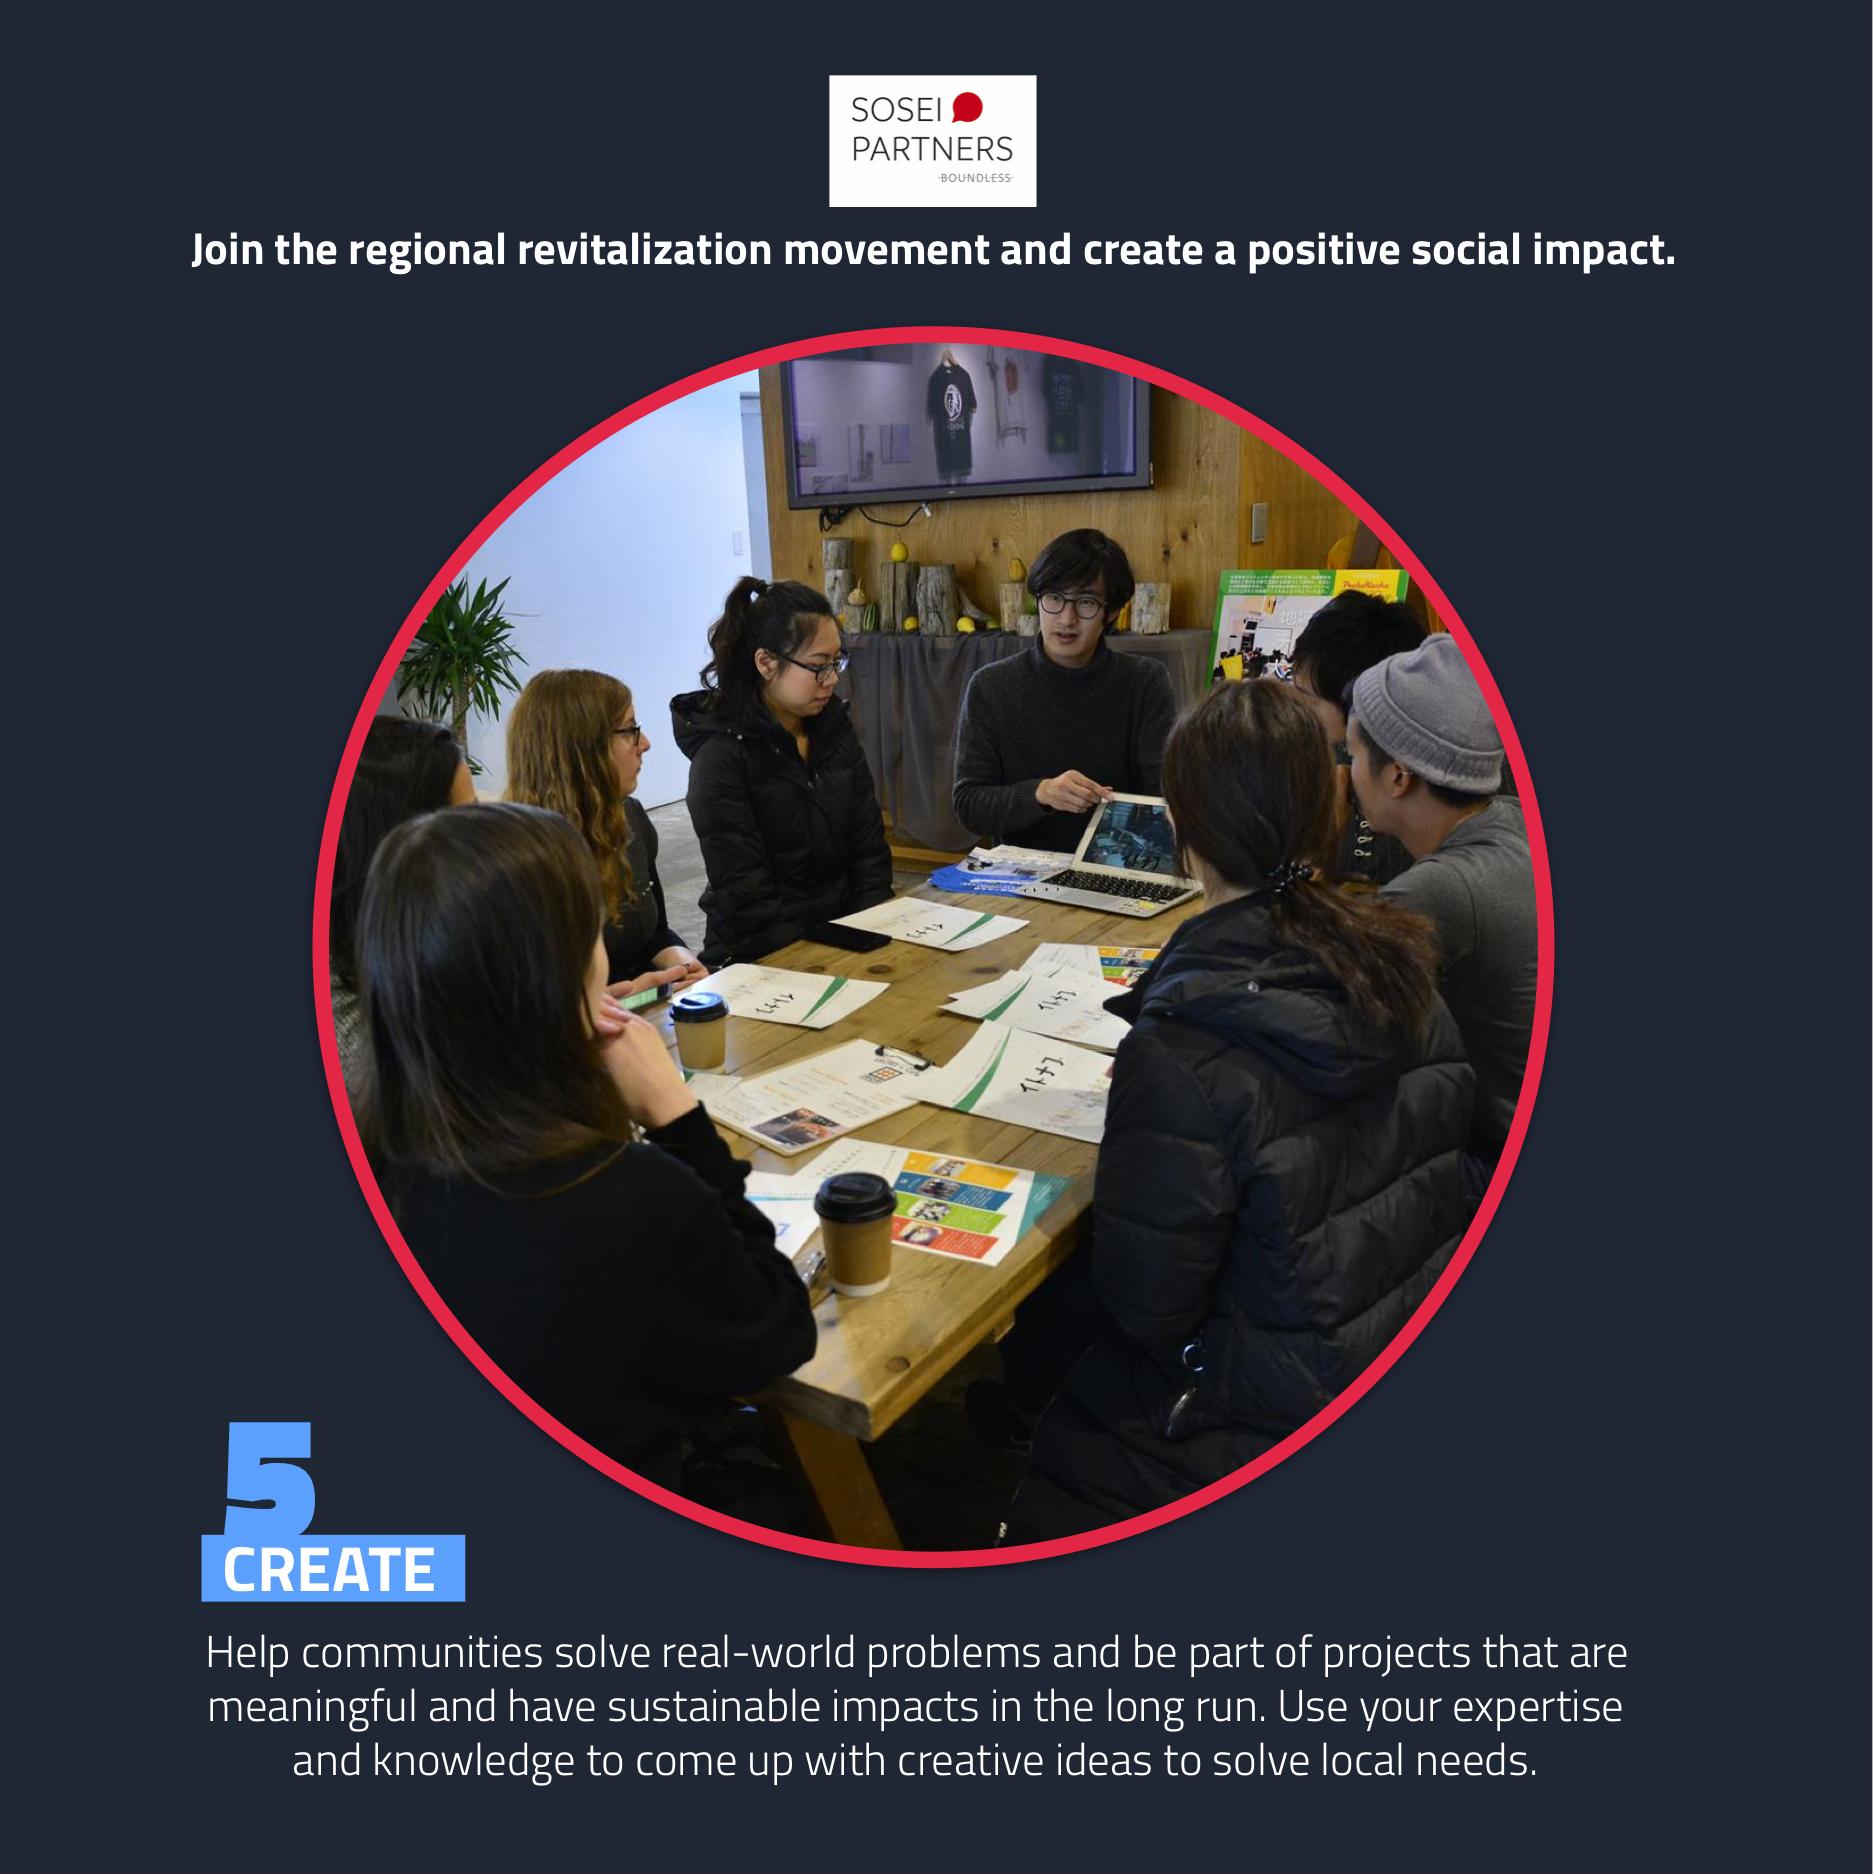 Sosei Partners FB Group Invite 5.png